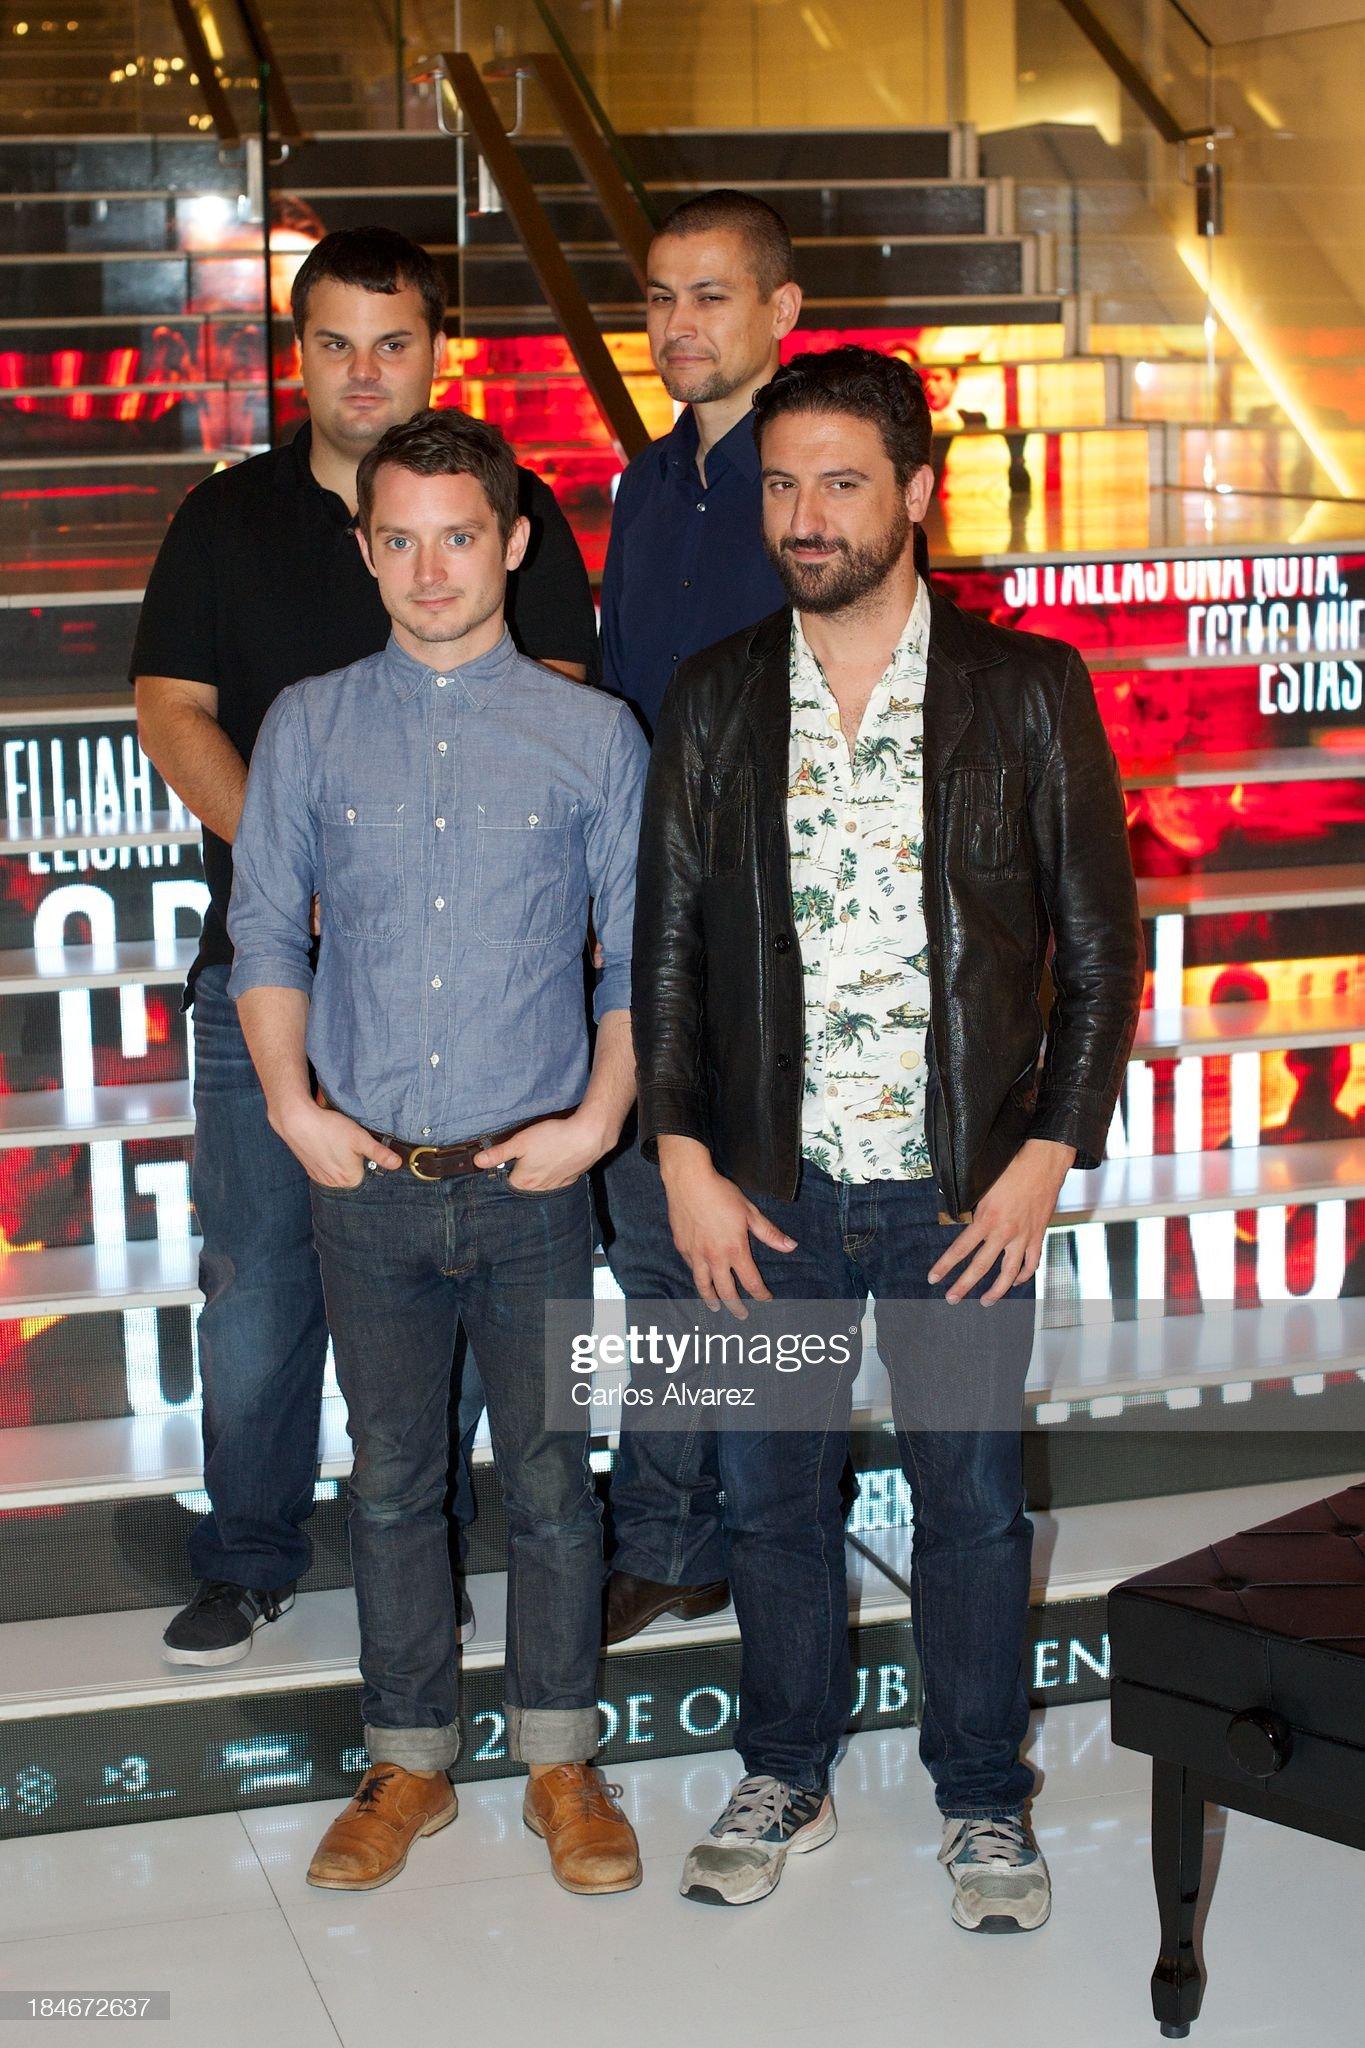 ¿Cuánto mide Eugenio Mira? - Altura Producer-adrian-guerra-actor-elijah-wood-producer-rodrigo-cortes-and-picture-id184672637?s=2048x2048